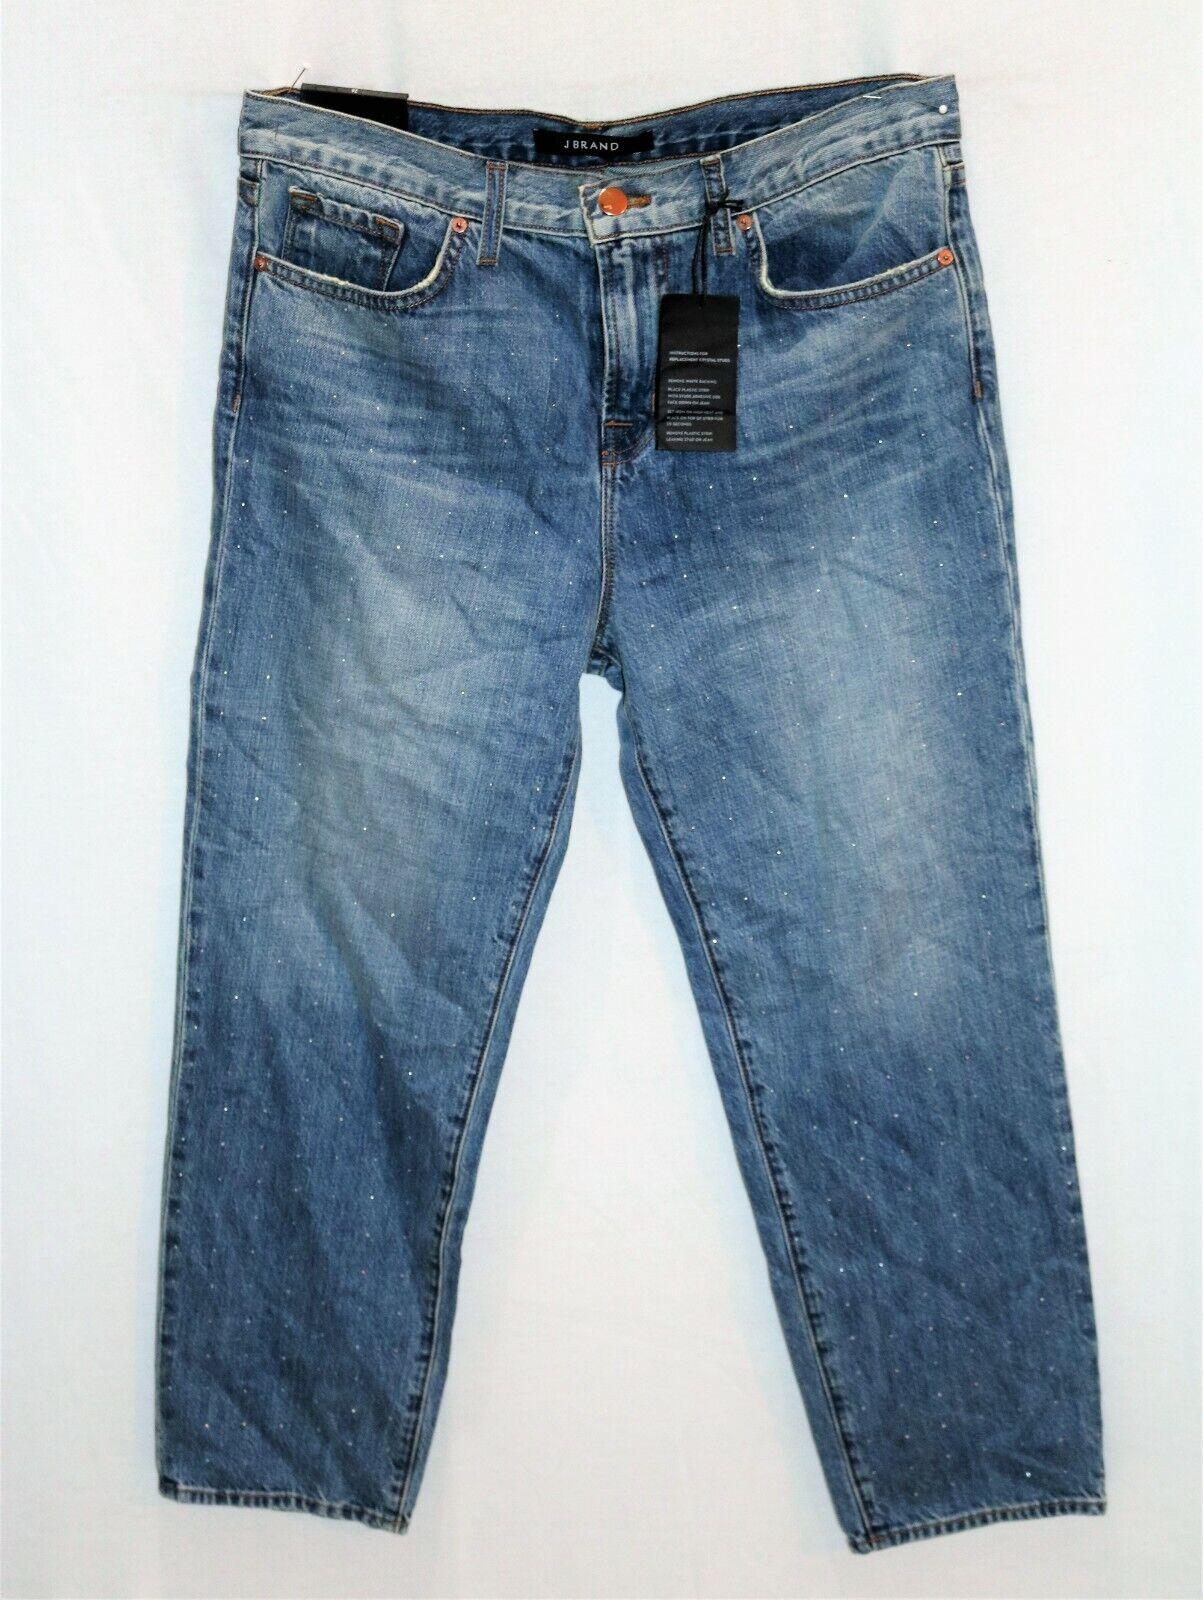 J BRAND Brand bluee Ace Cropped Bodyfriend Denim Jeans Size 26